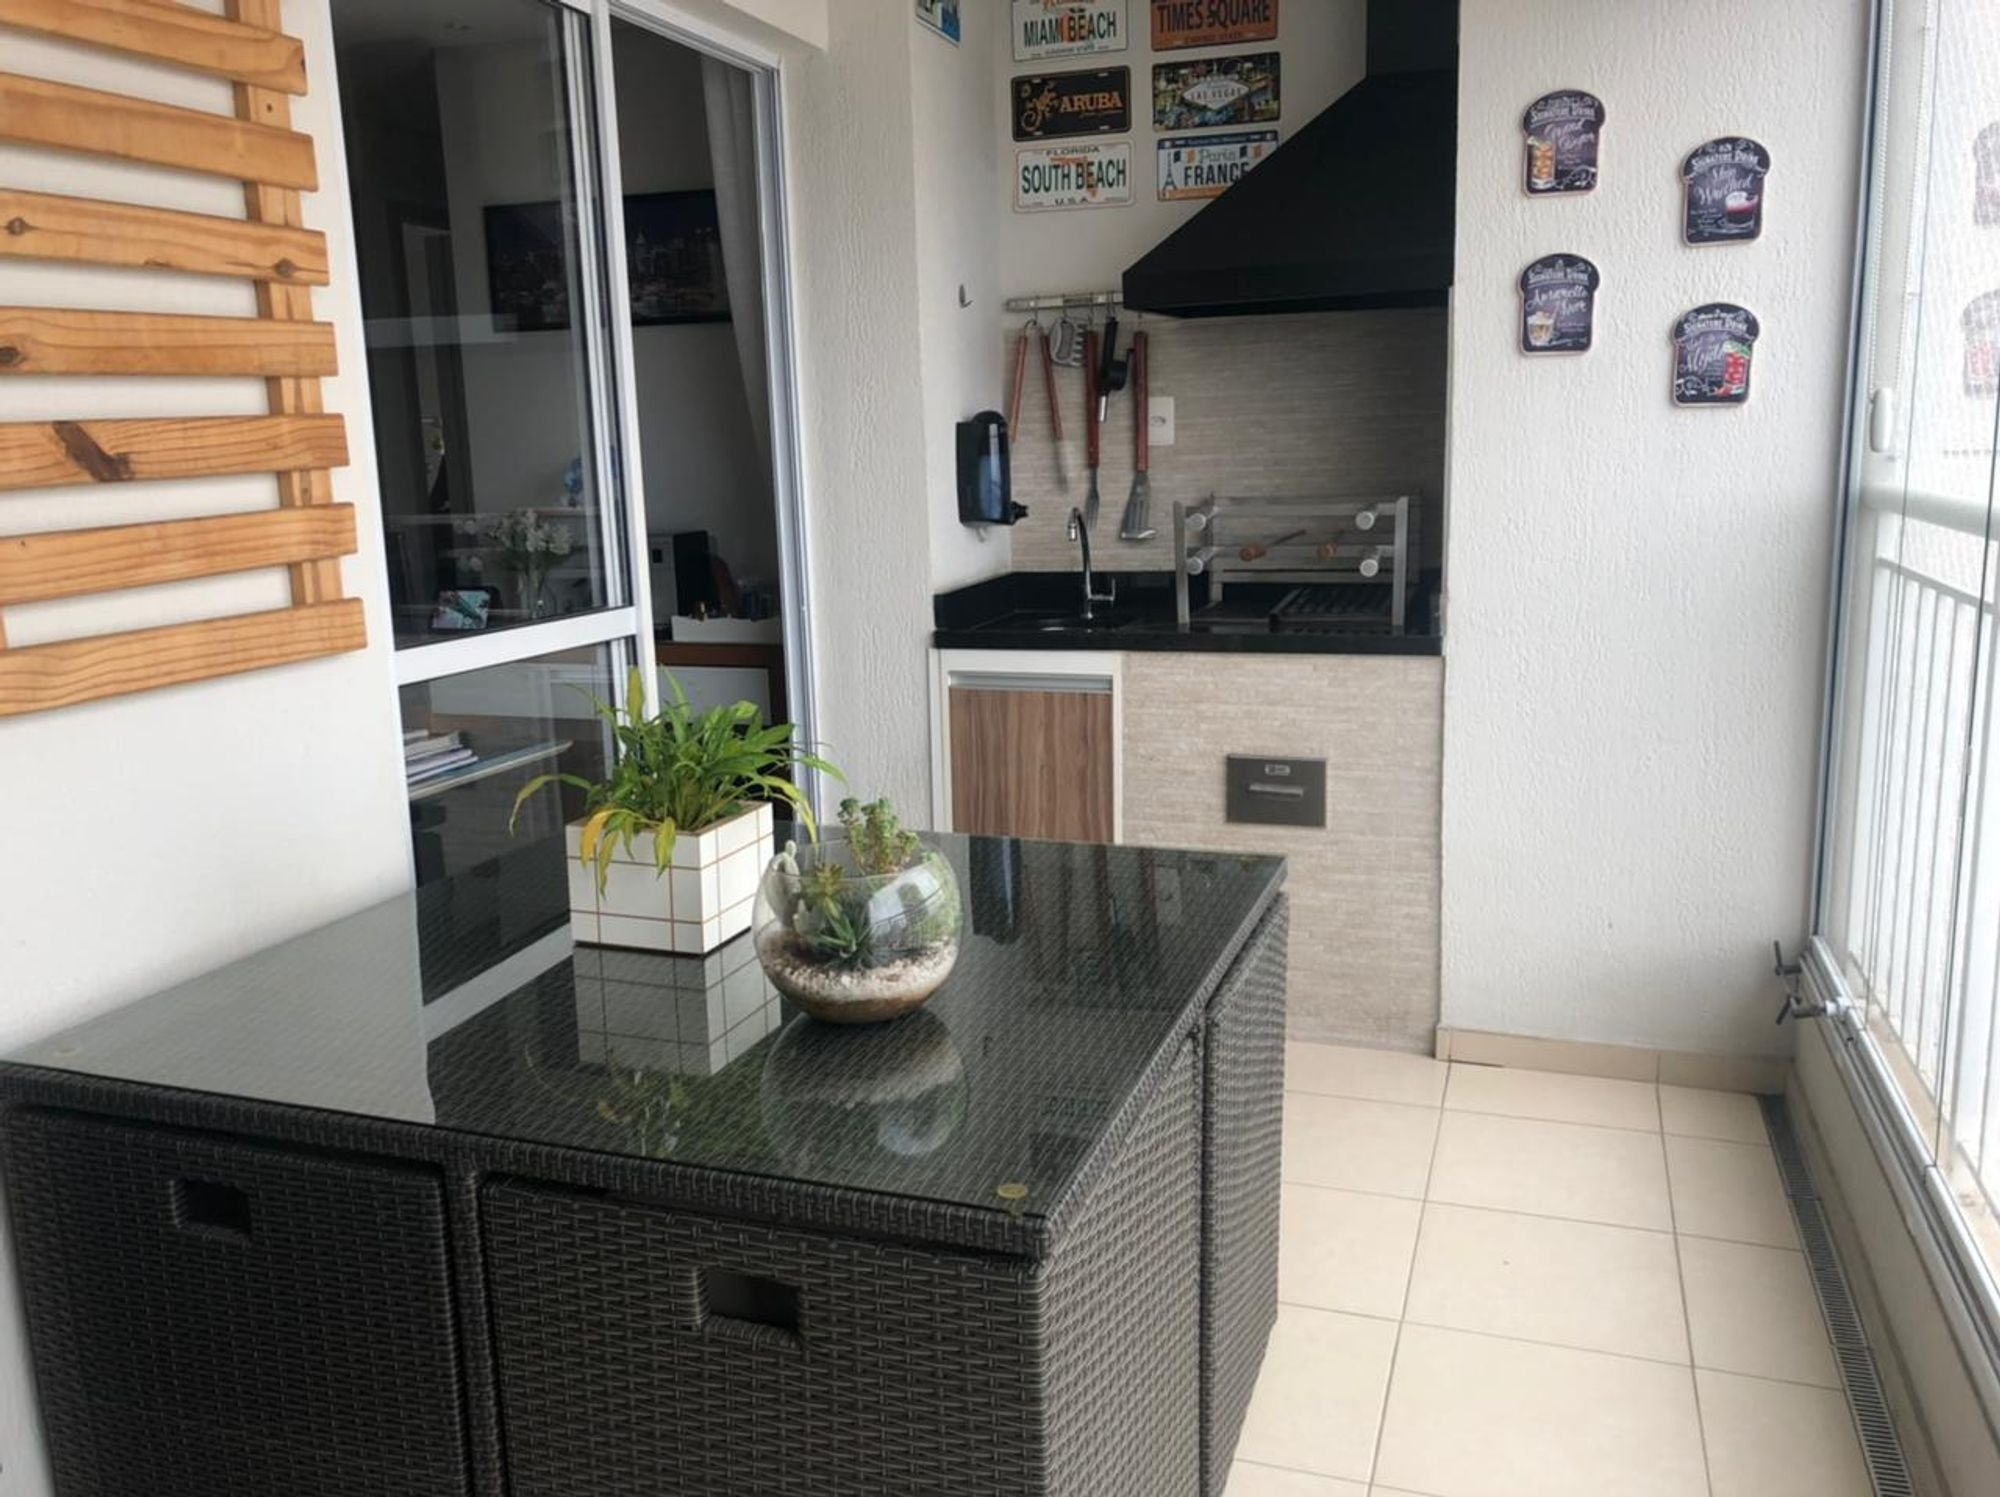 Foto de Cozinha com vaso de planta, vaso